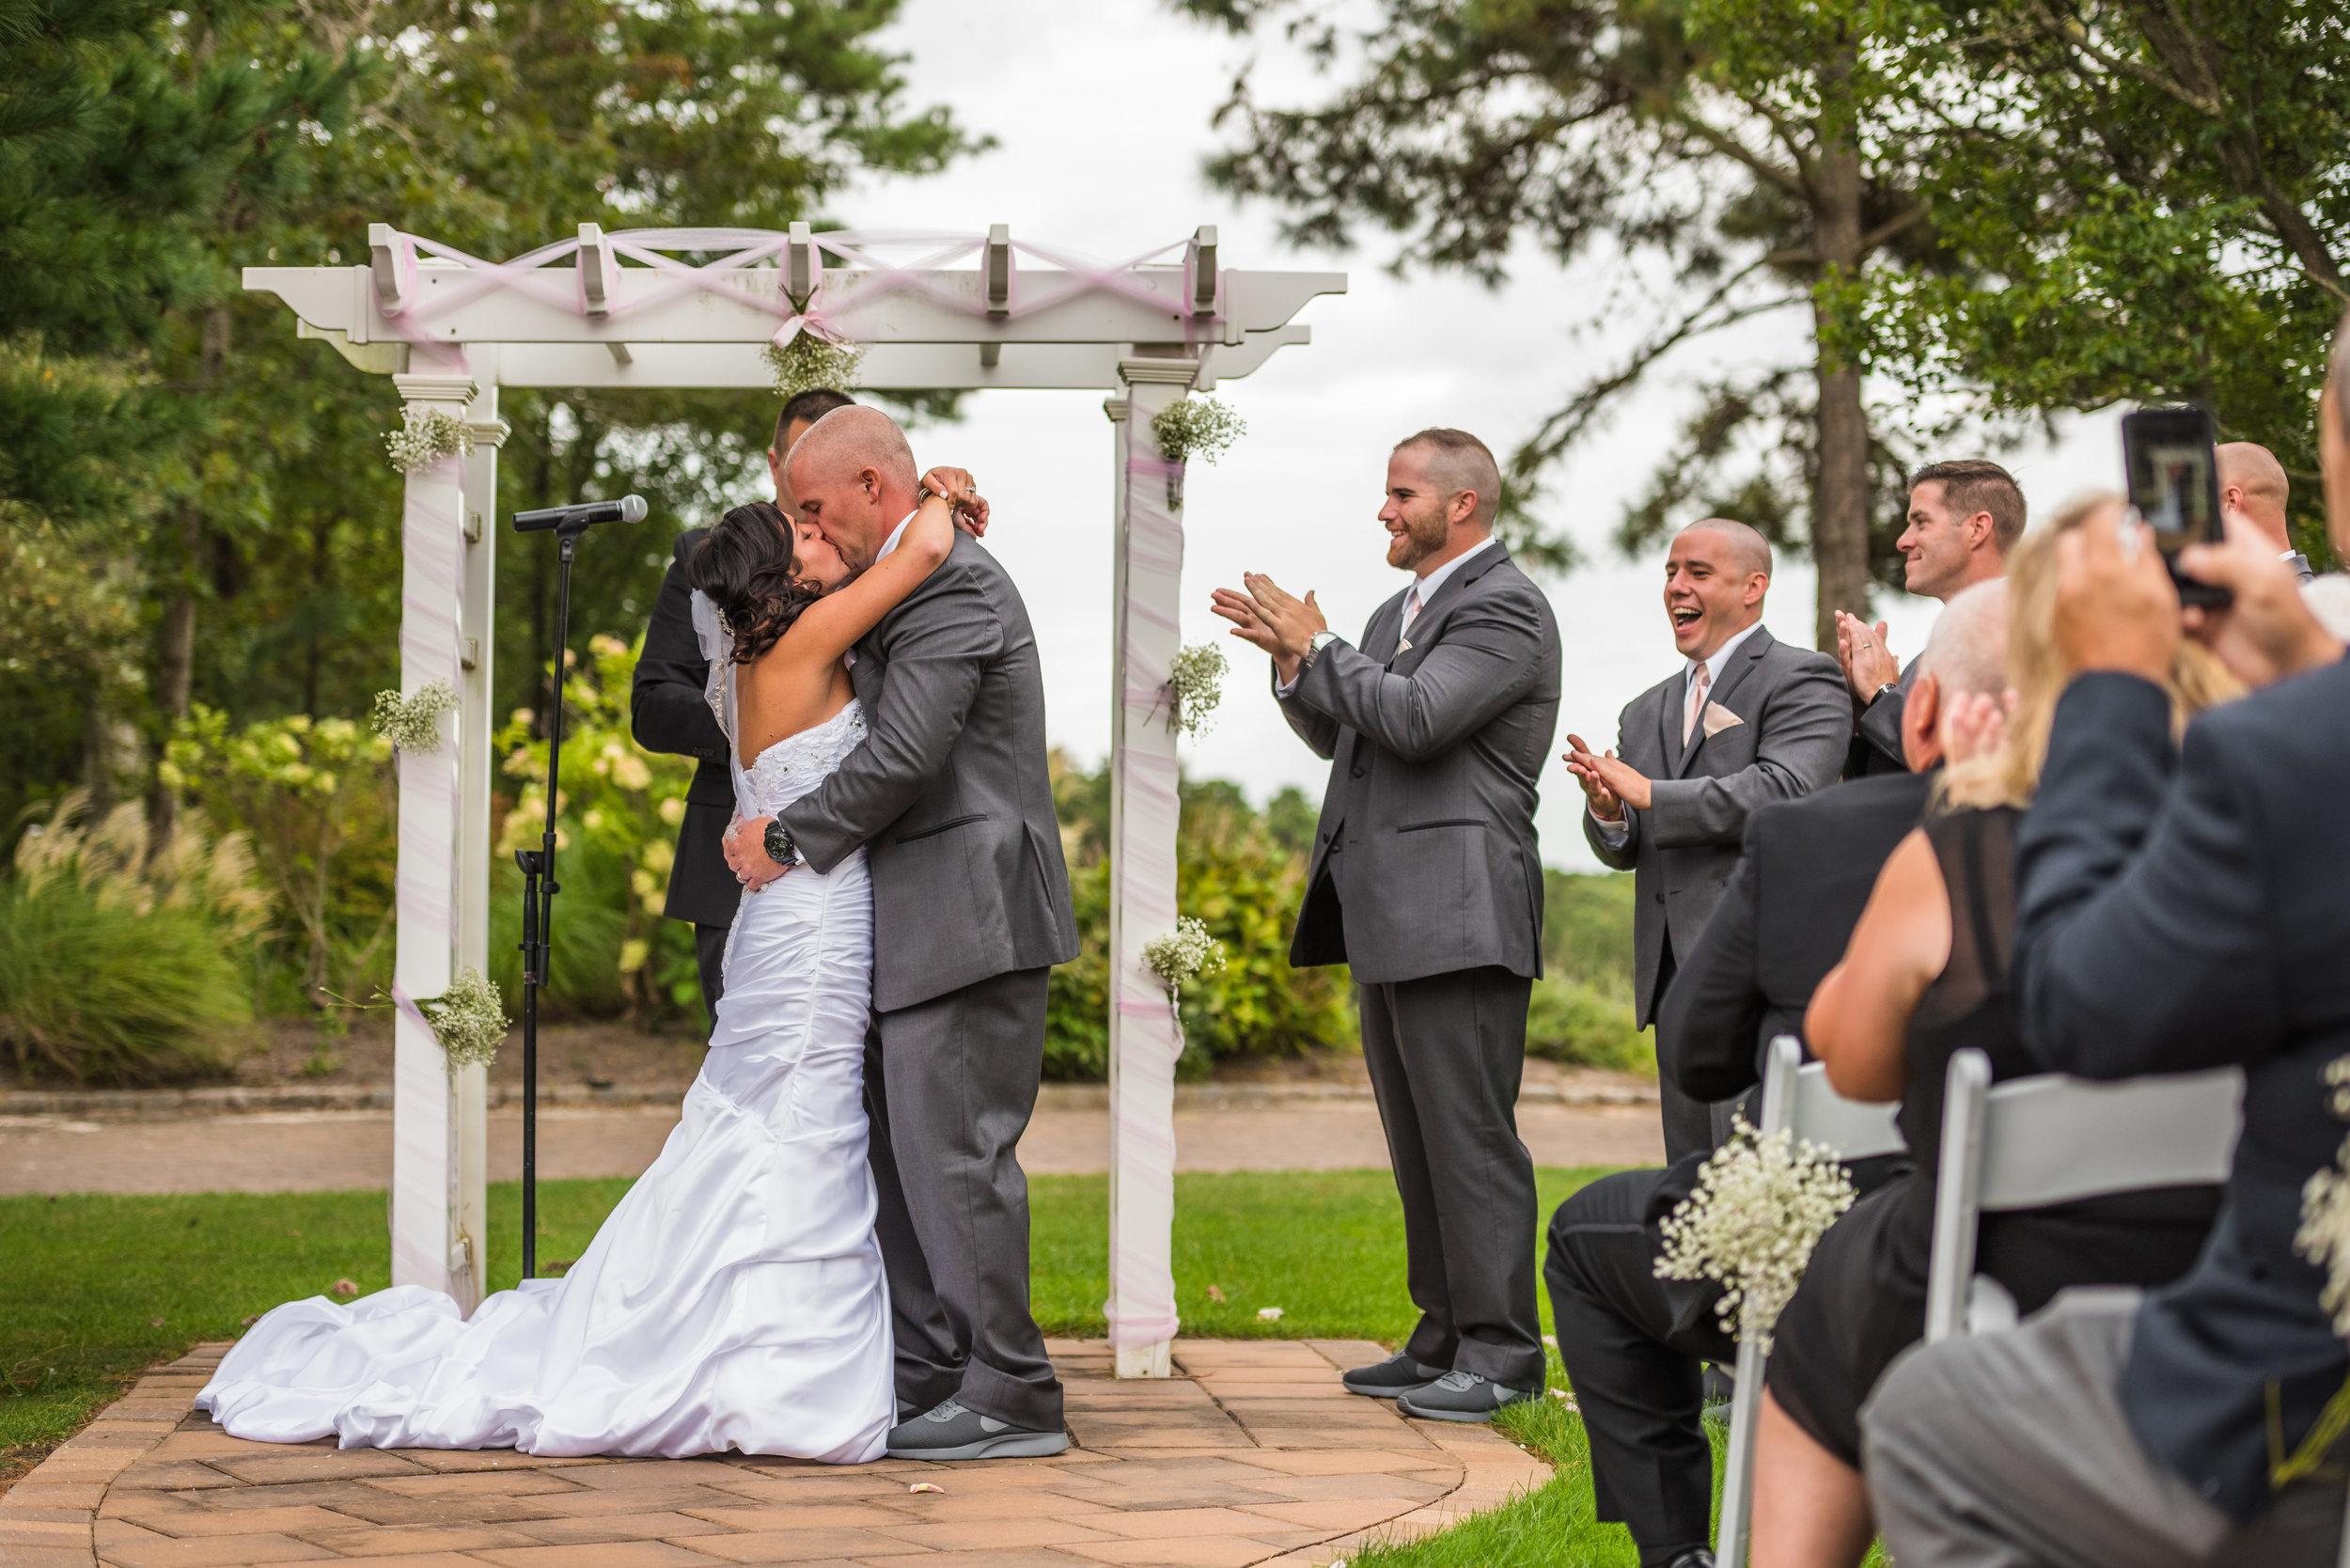 Seaoaks Wedding Photos Steph 23